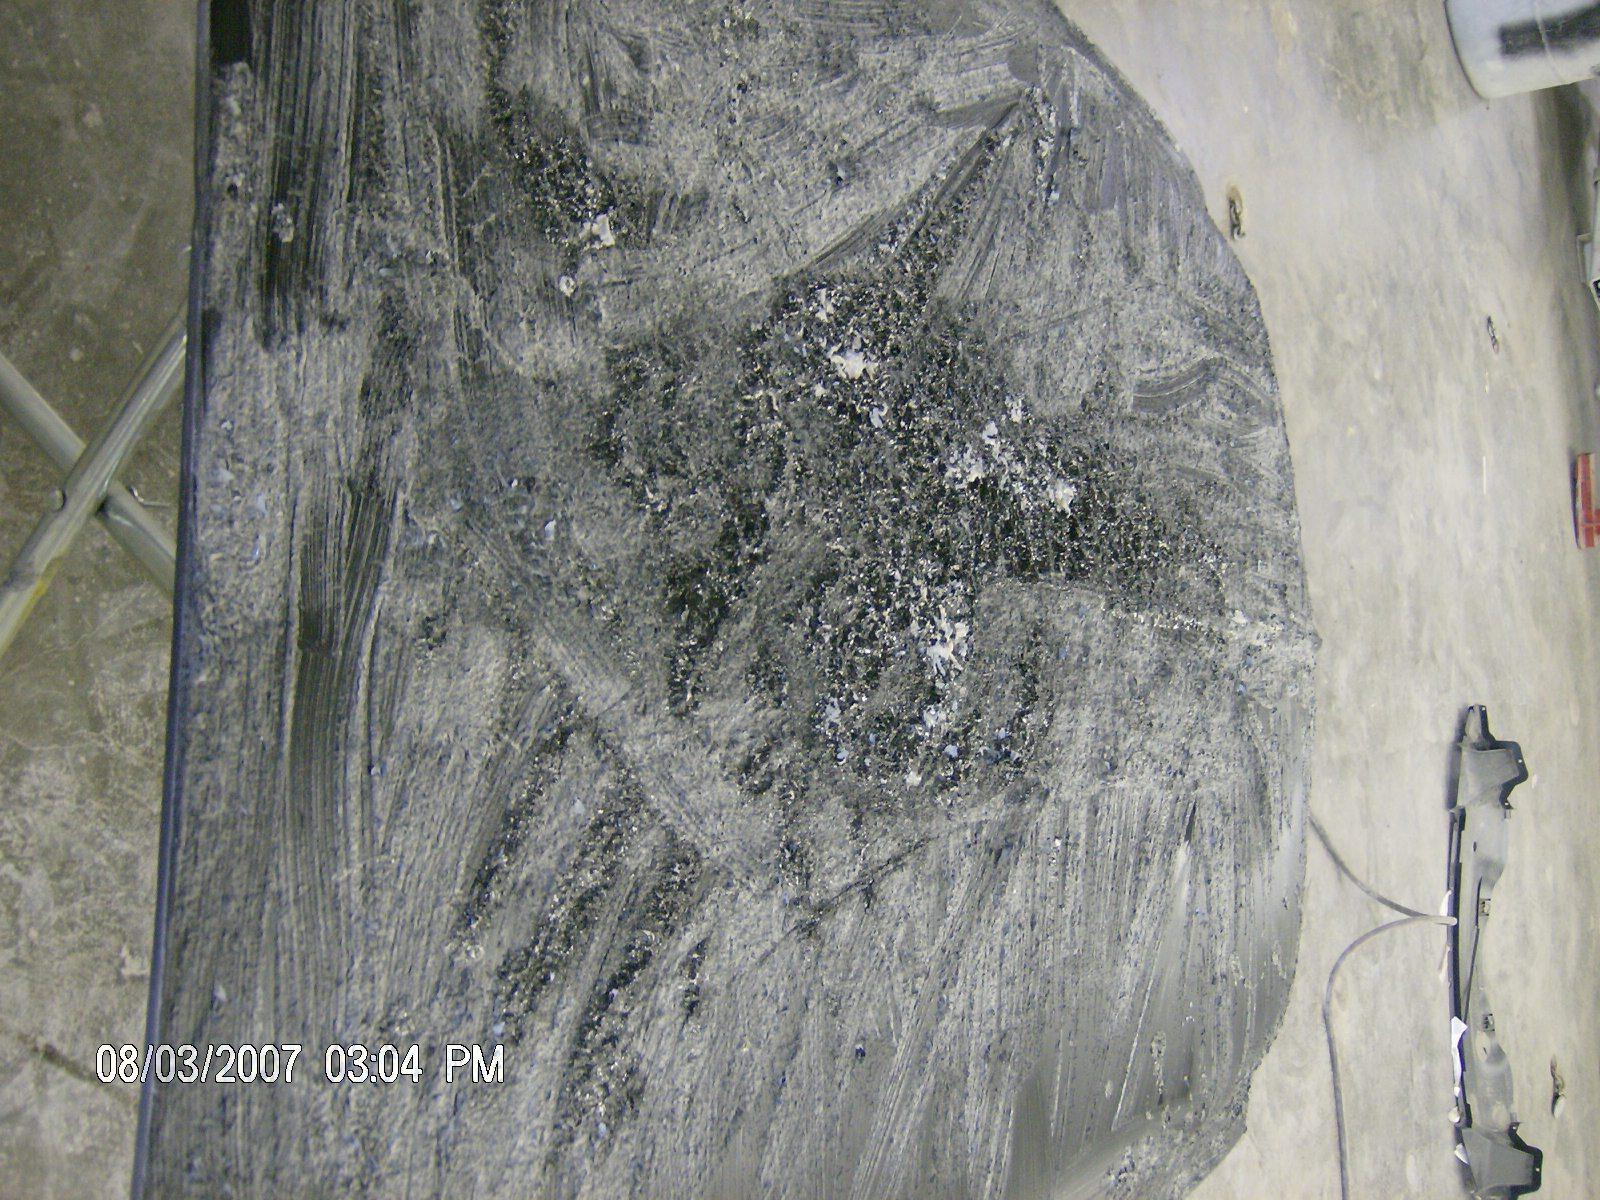 Copy of AUG 29TH GHIA PHOTO'S 005 2.jpg